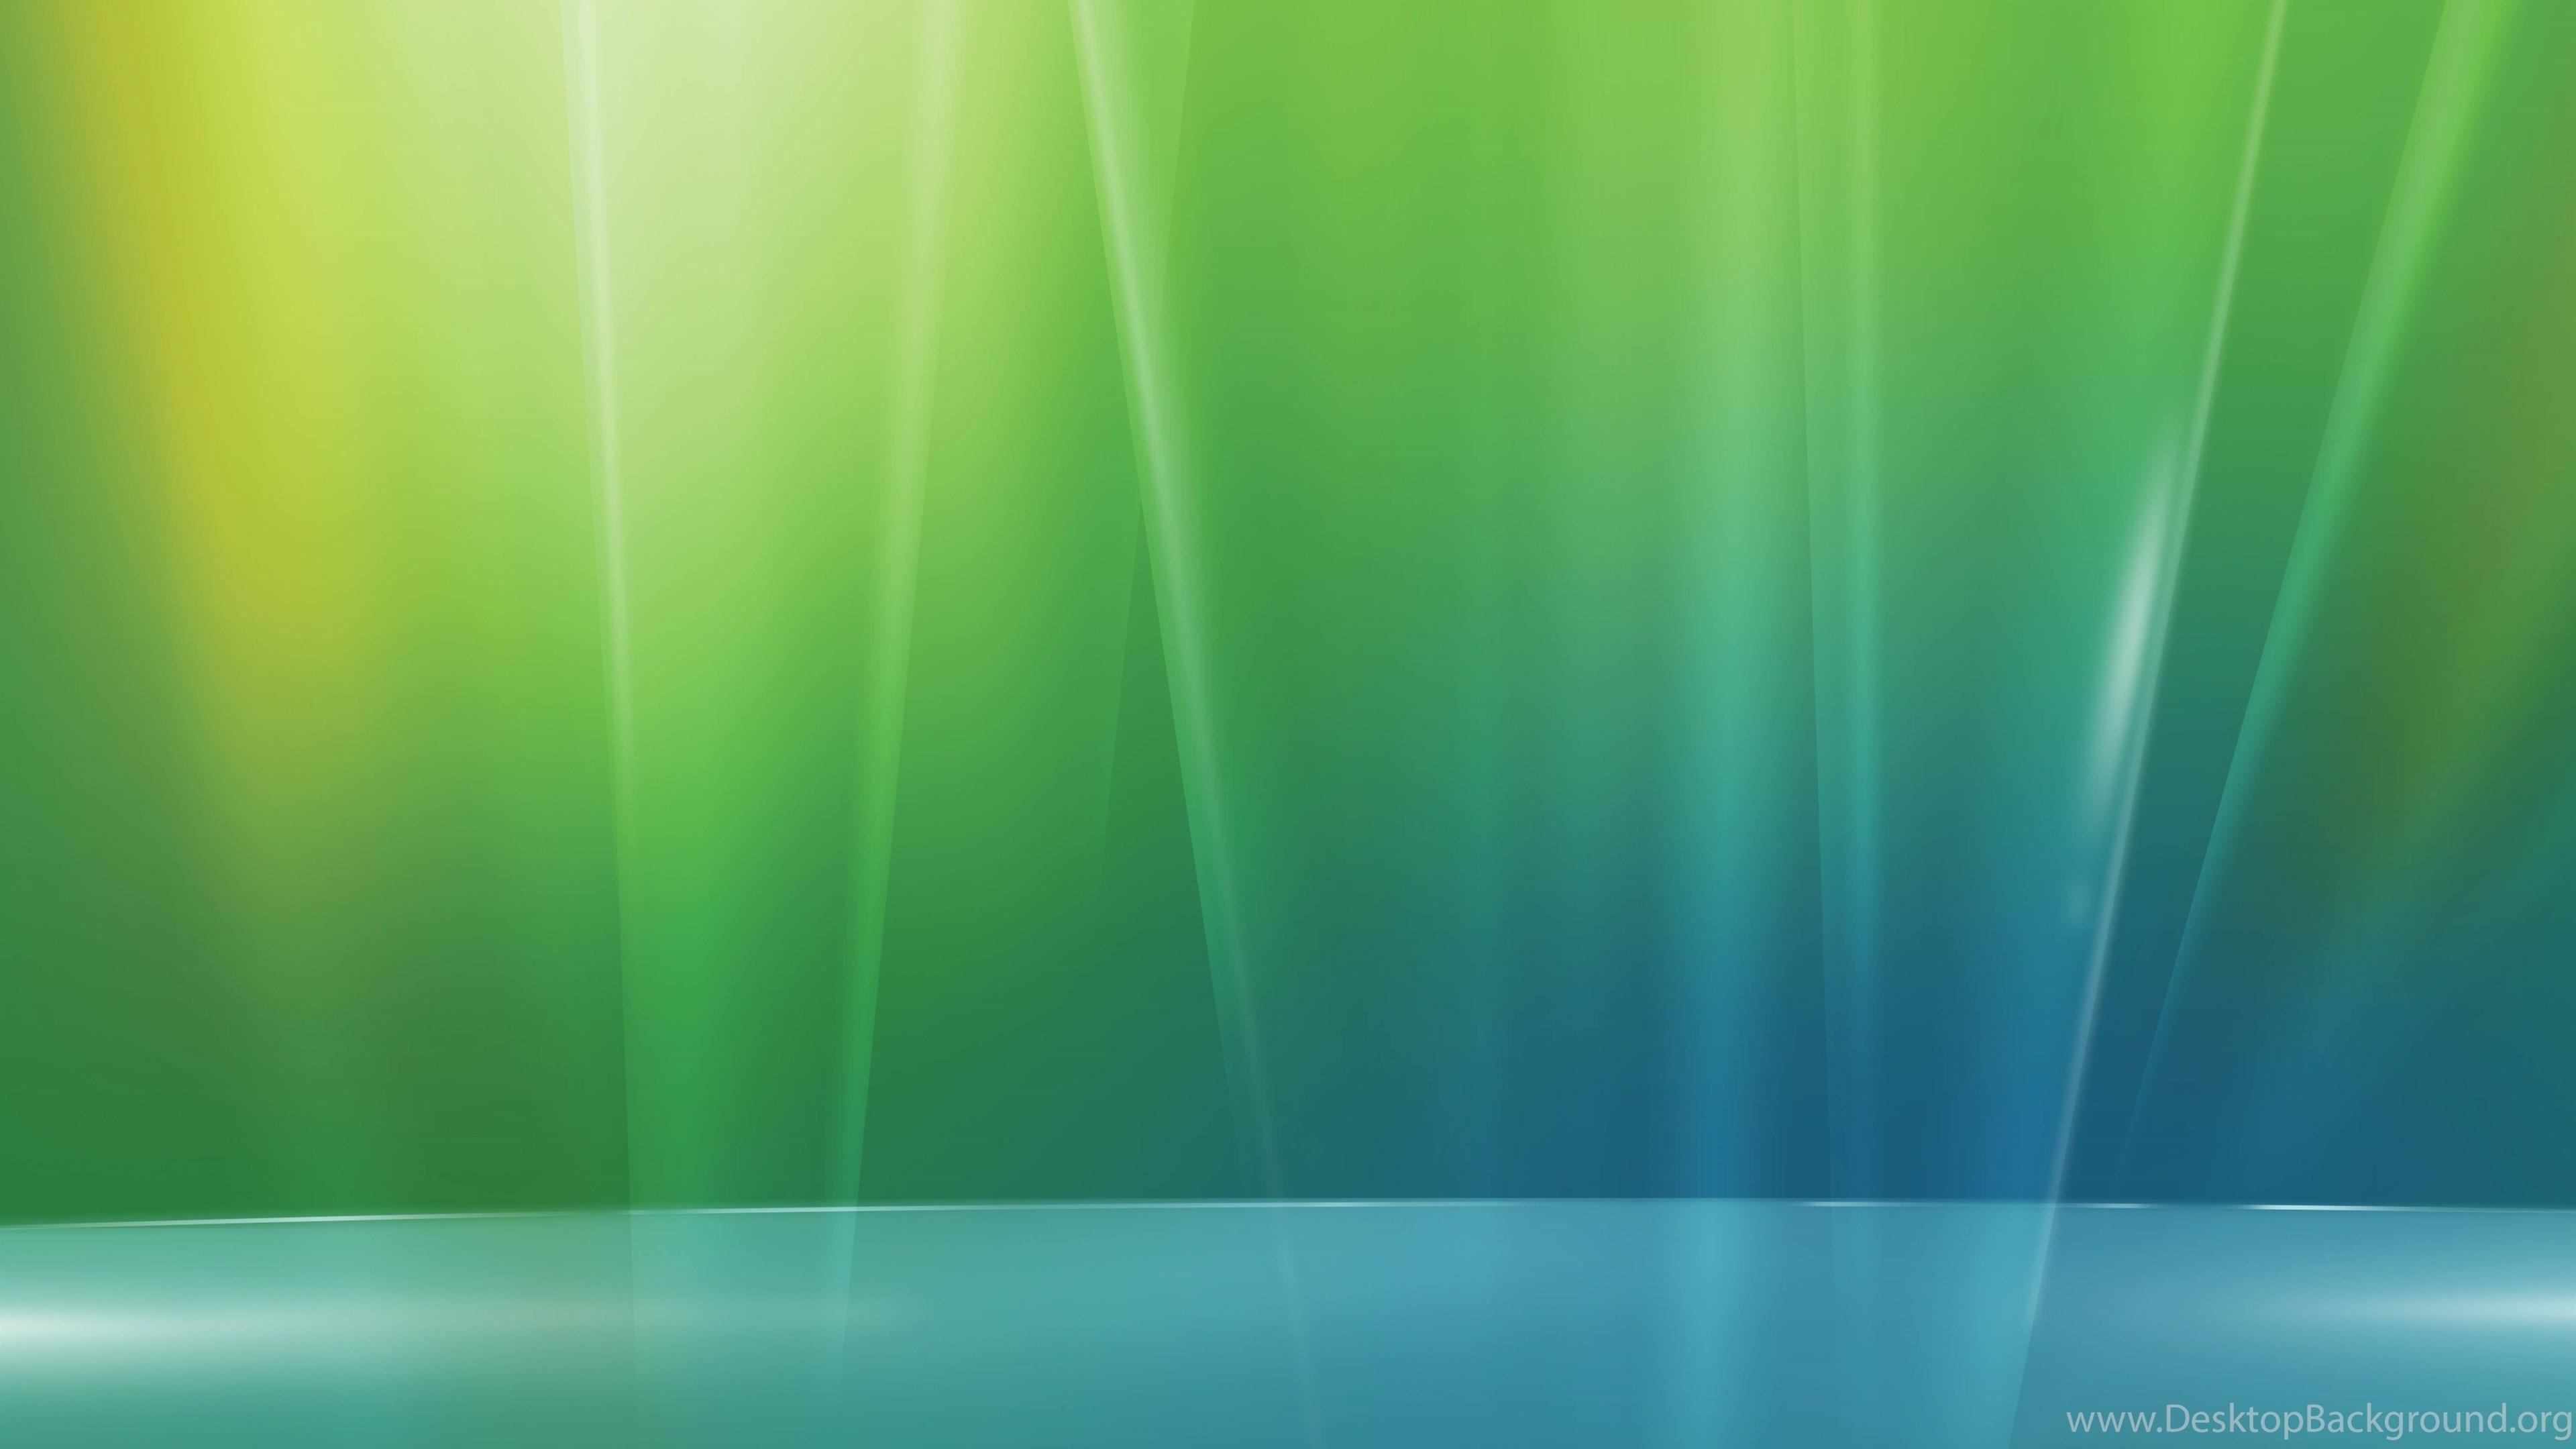 Windows Vista Aurora Wallpaper (57+ images)